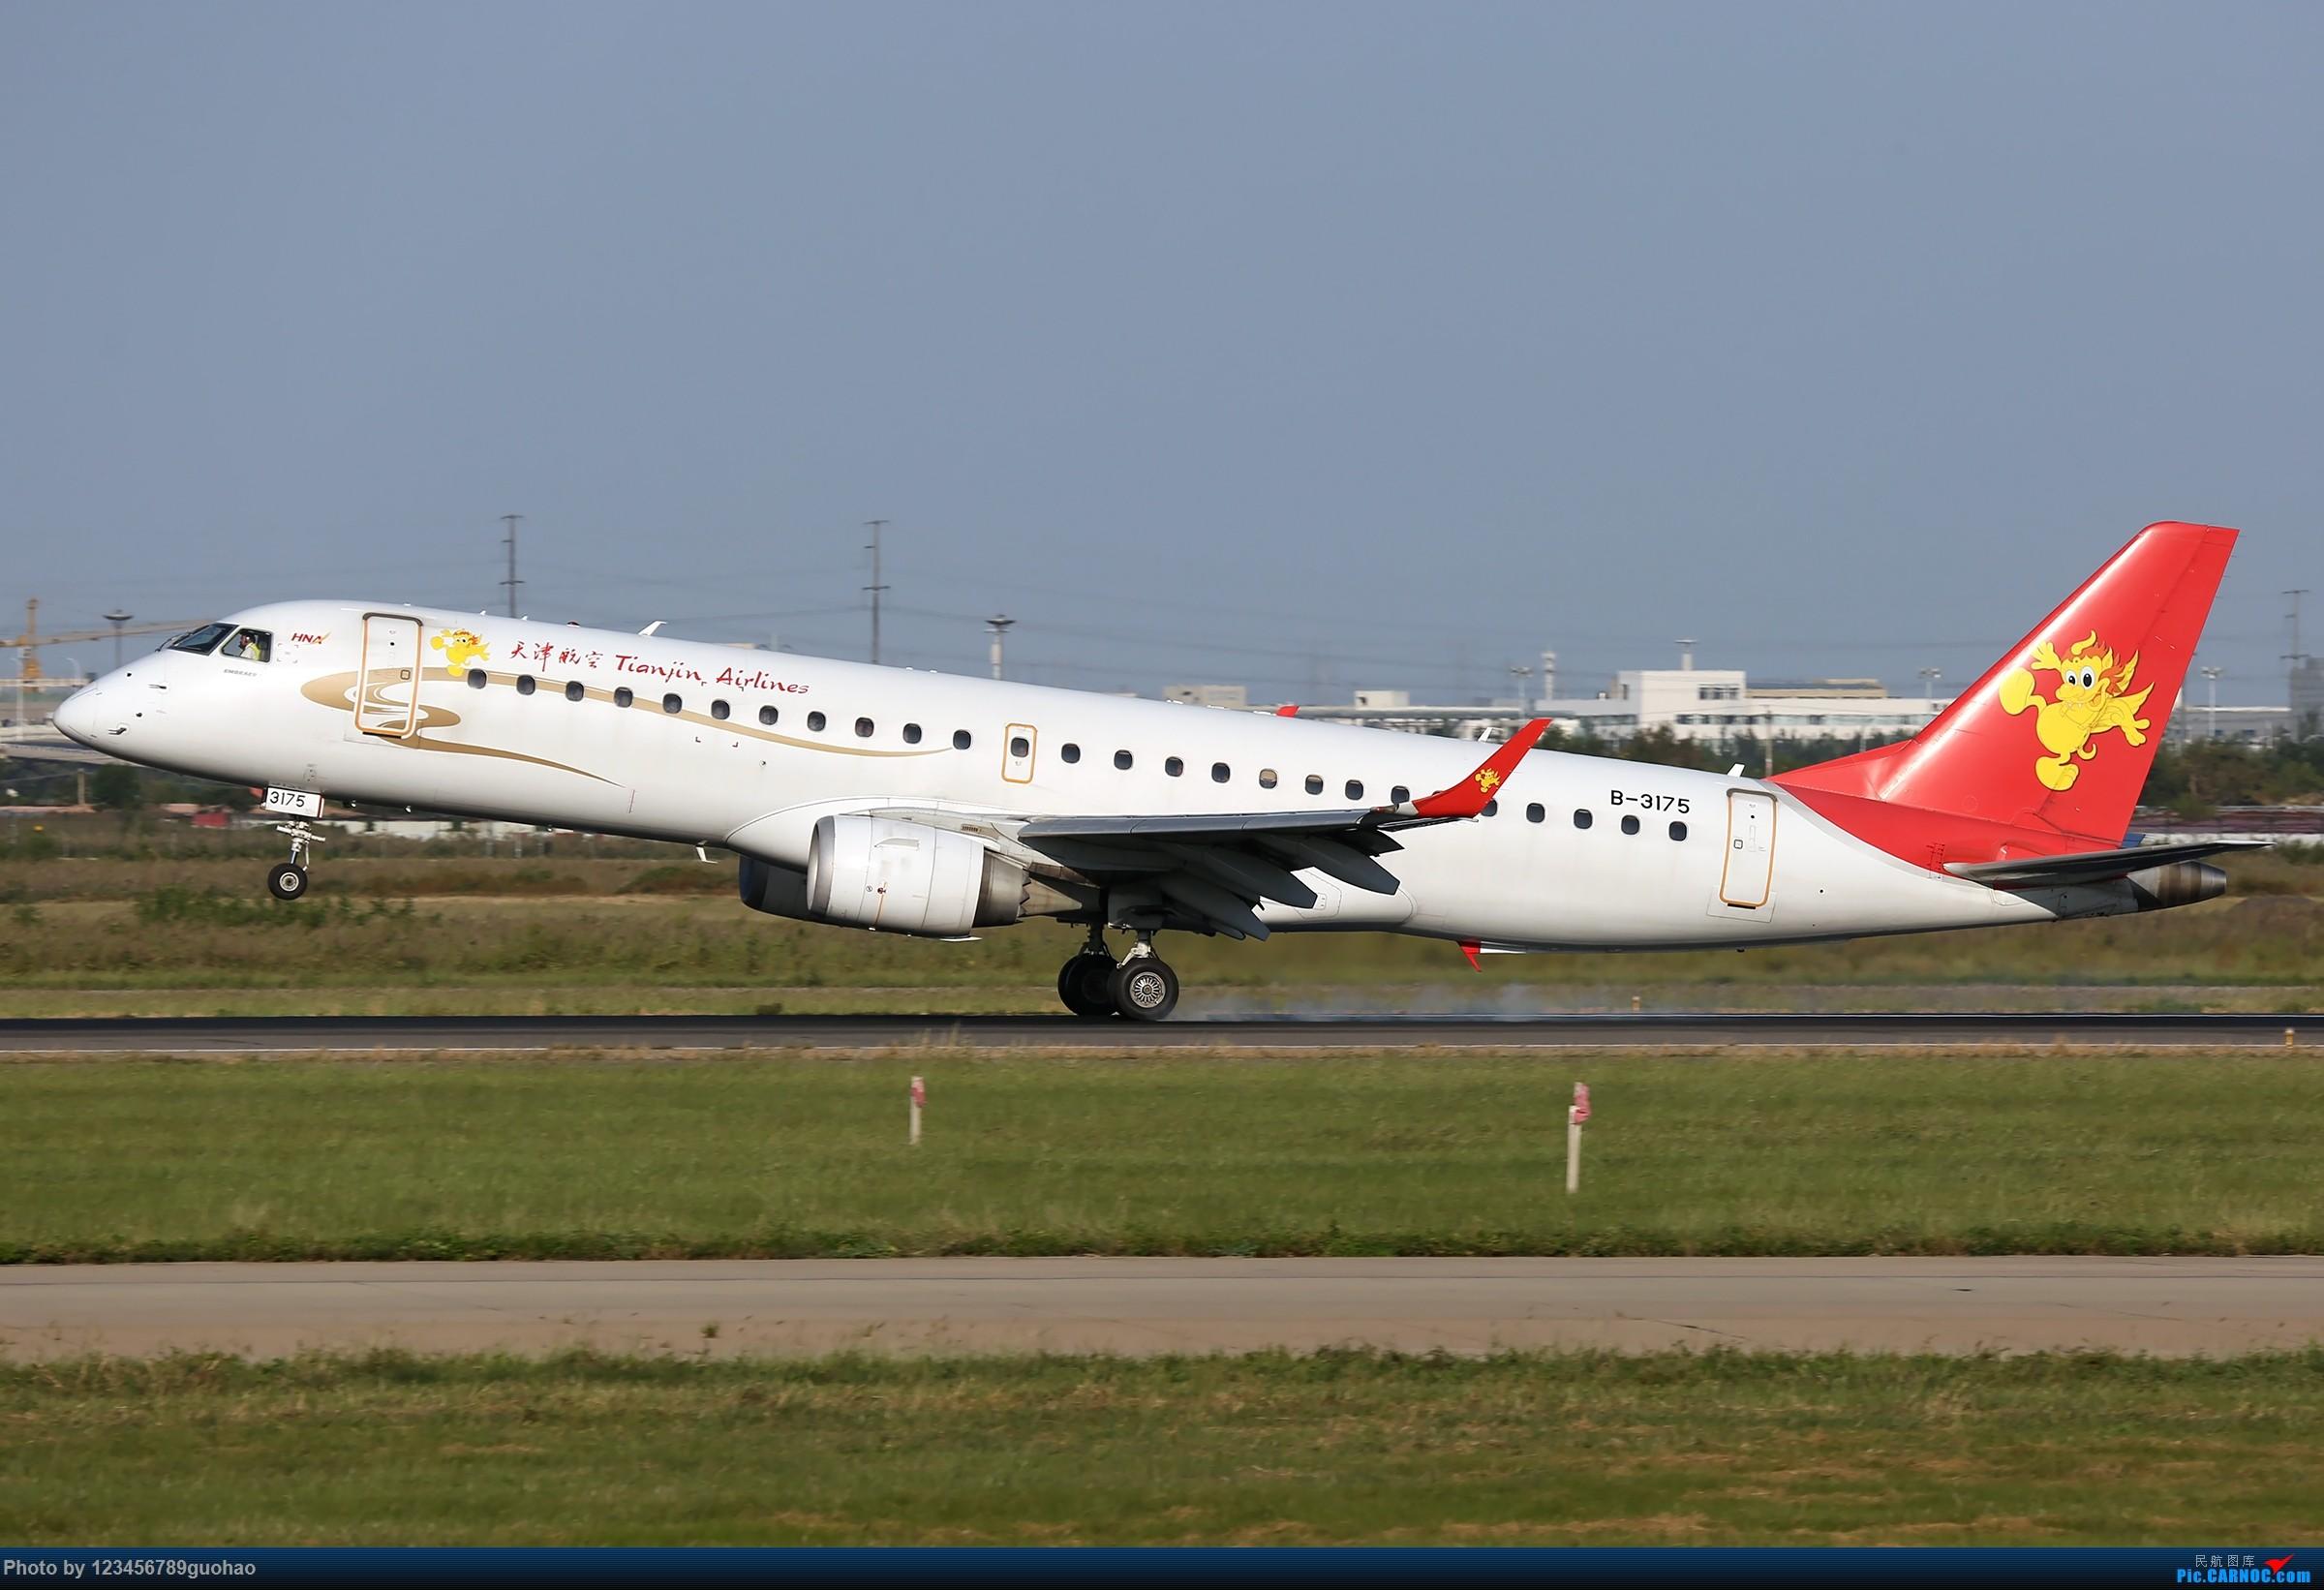 Re:[原创]TSN多图-后脚着地 EMBRAER E-190 B-3175 天津滨海国际机场